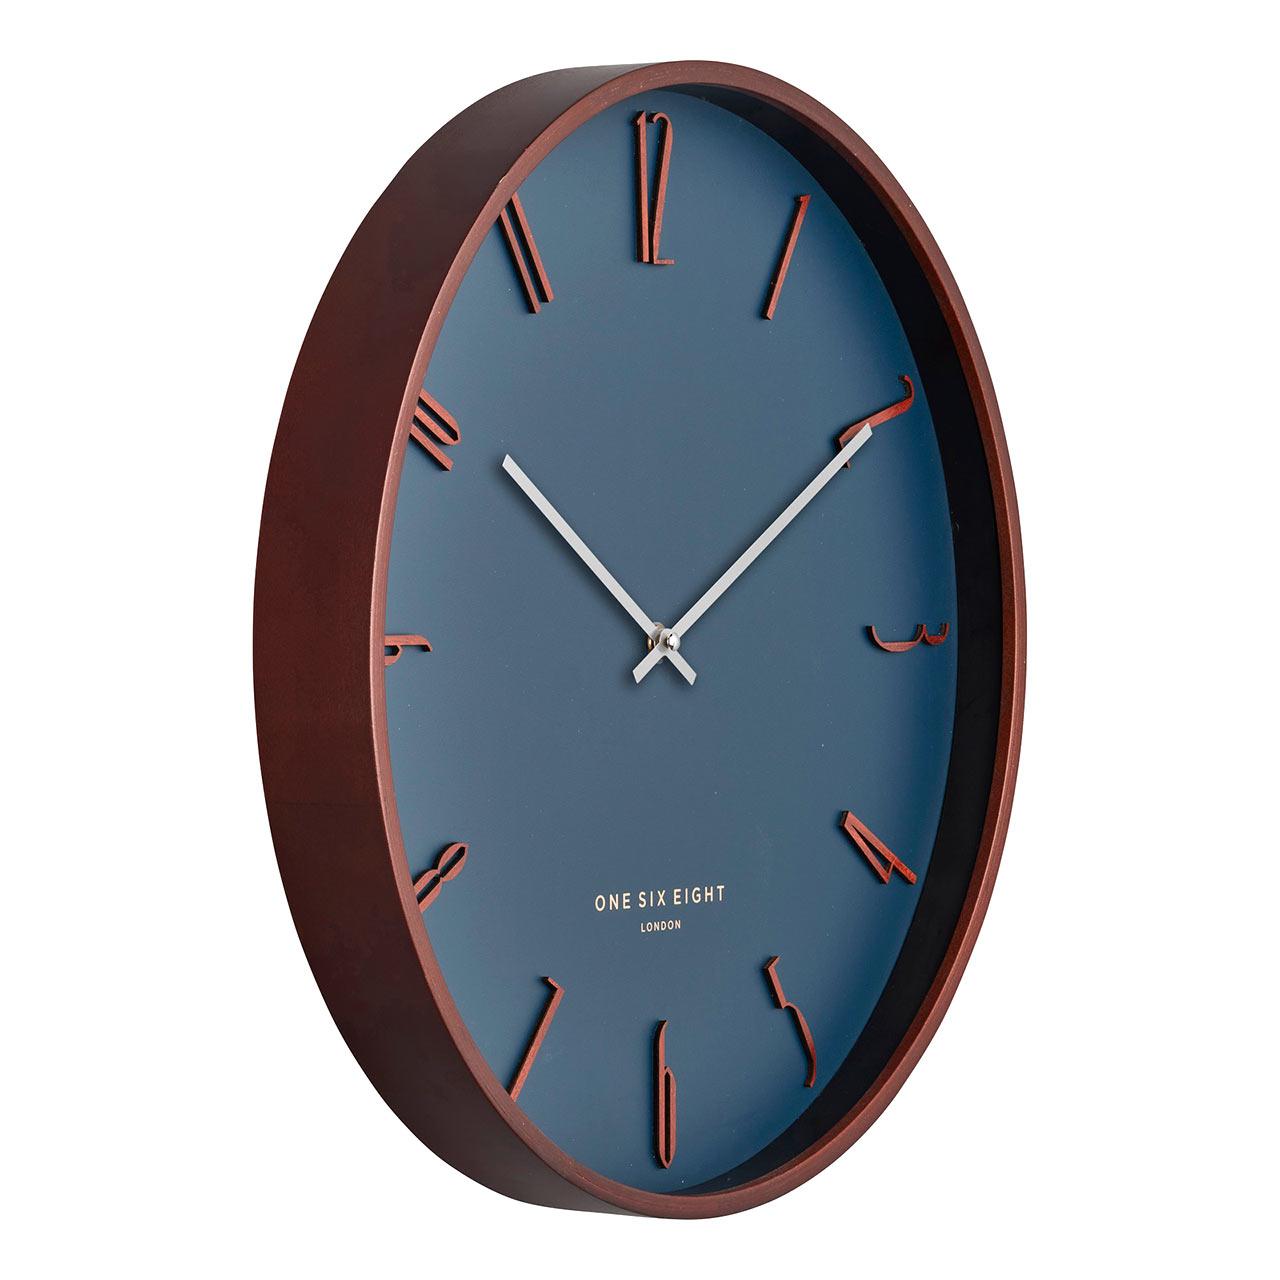 ONE SIX EIGHT LONDON silent wall clock SAMUEL petrol cool grey - Ø 41 x 4.5 cm | the design gift shop